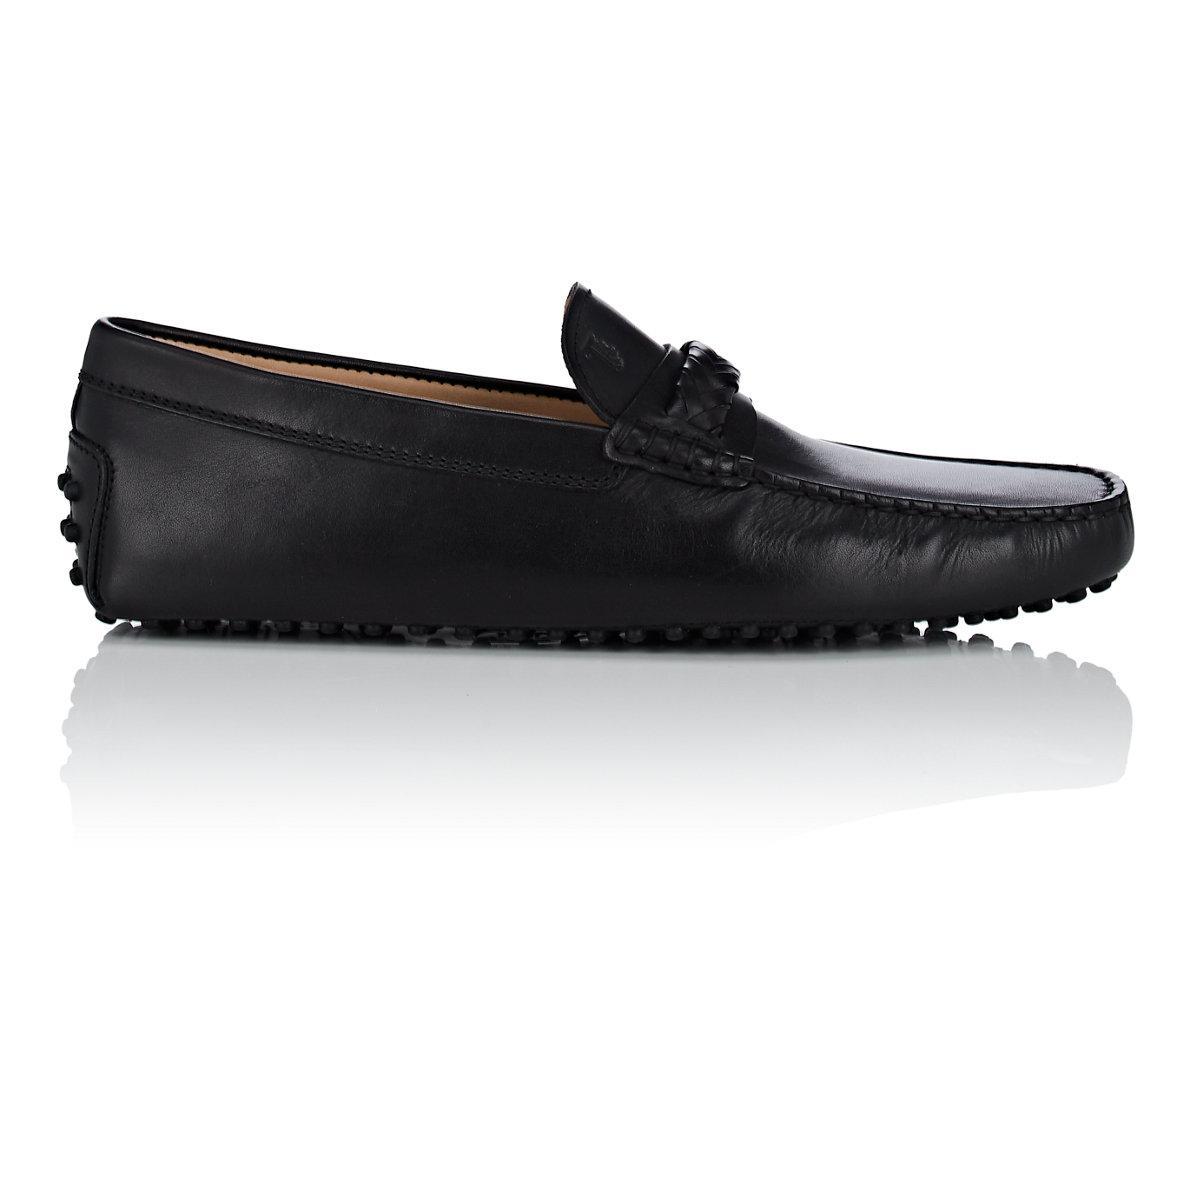 Tod's Loafer A0X0105 leather dark PFORFTXQB